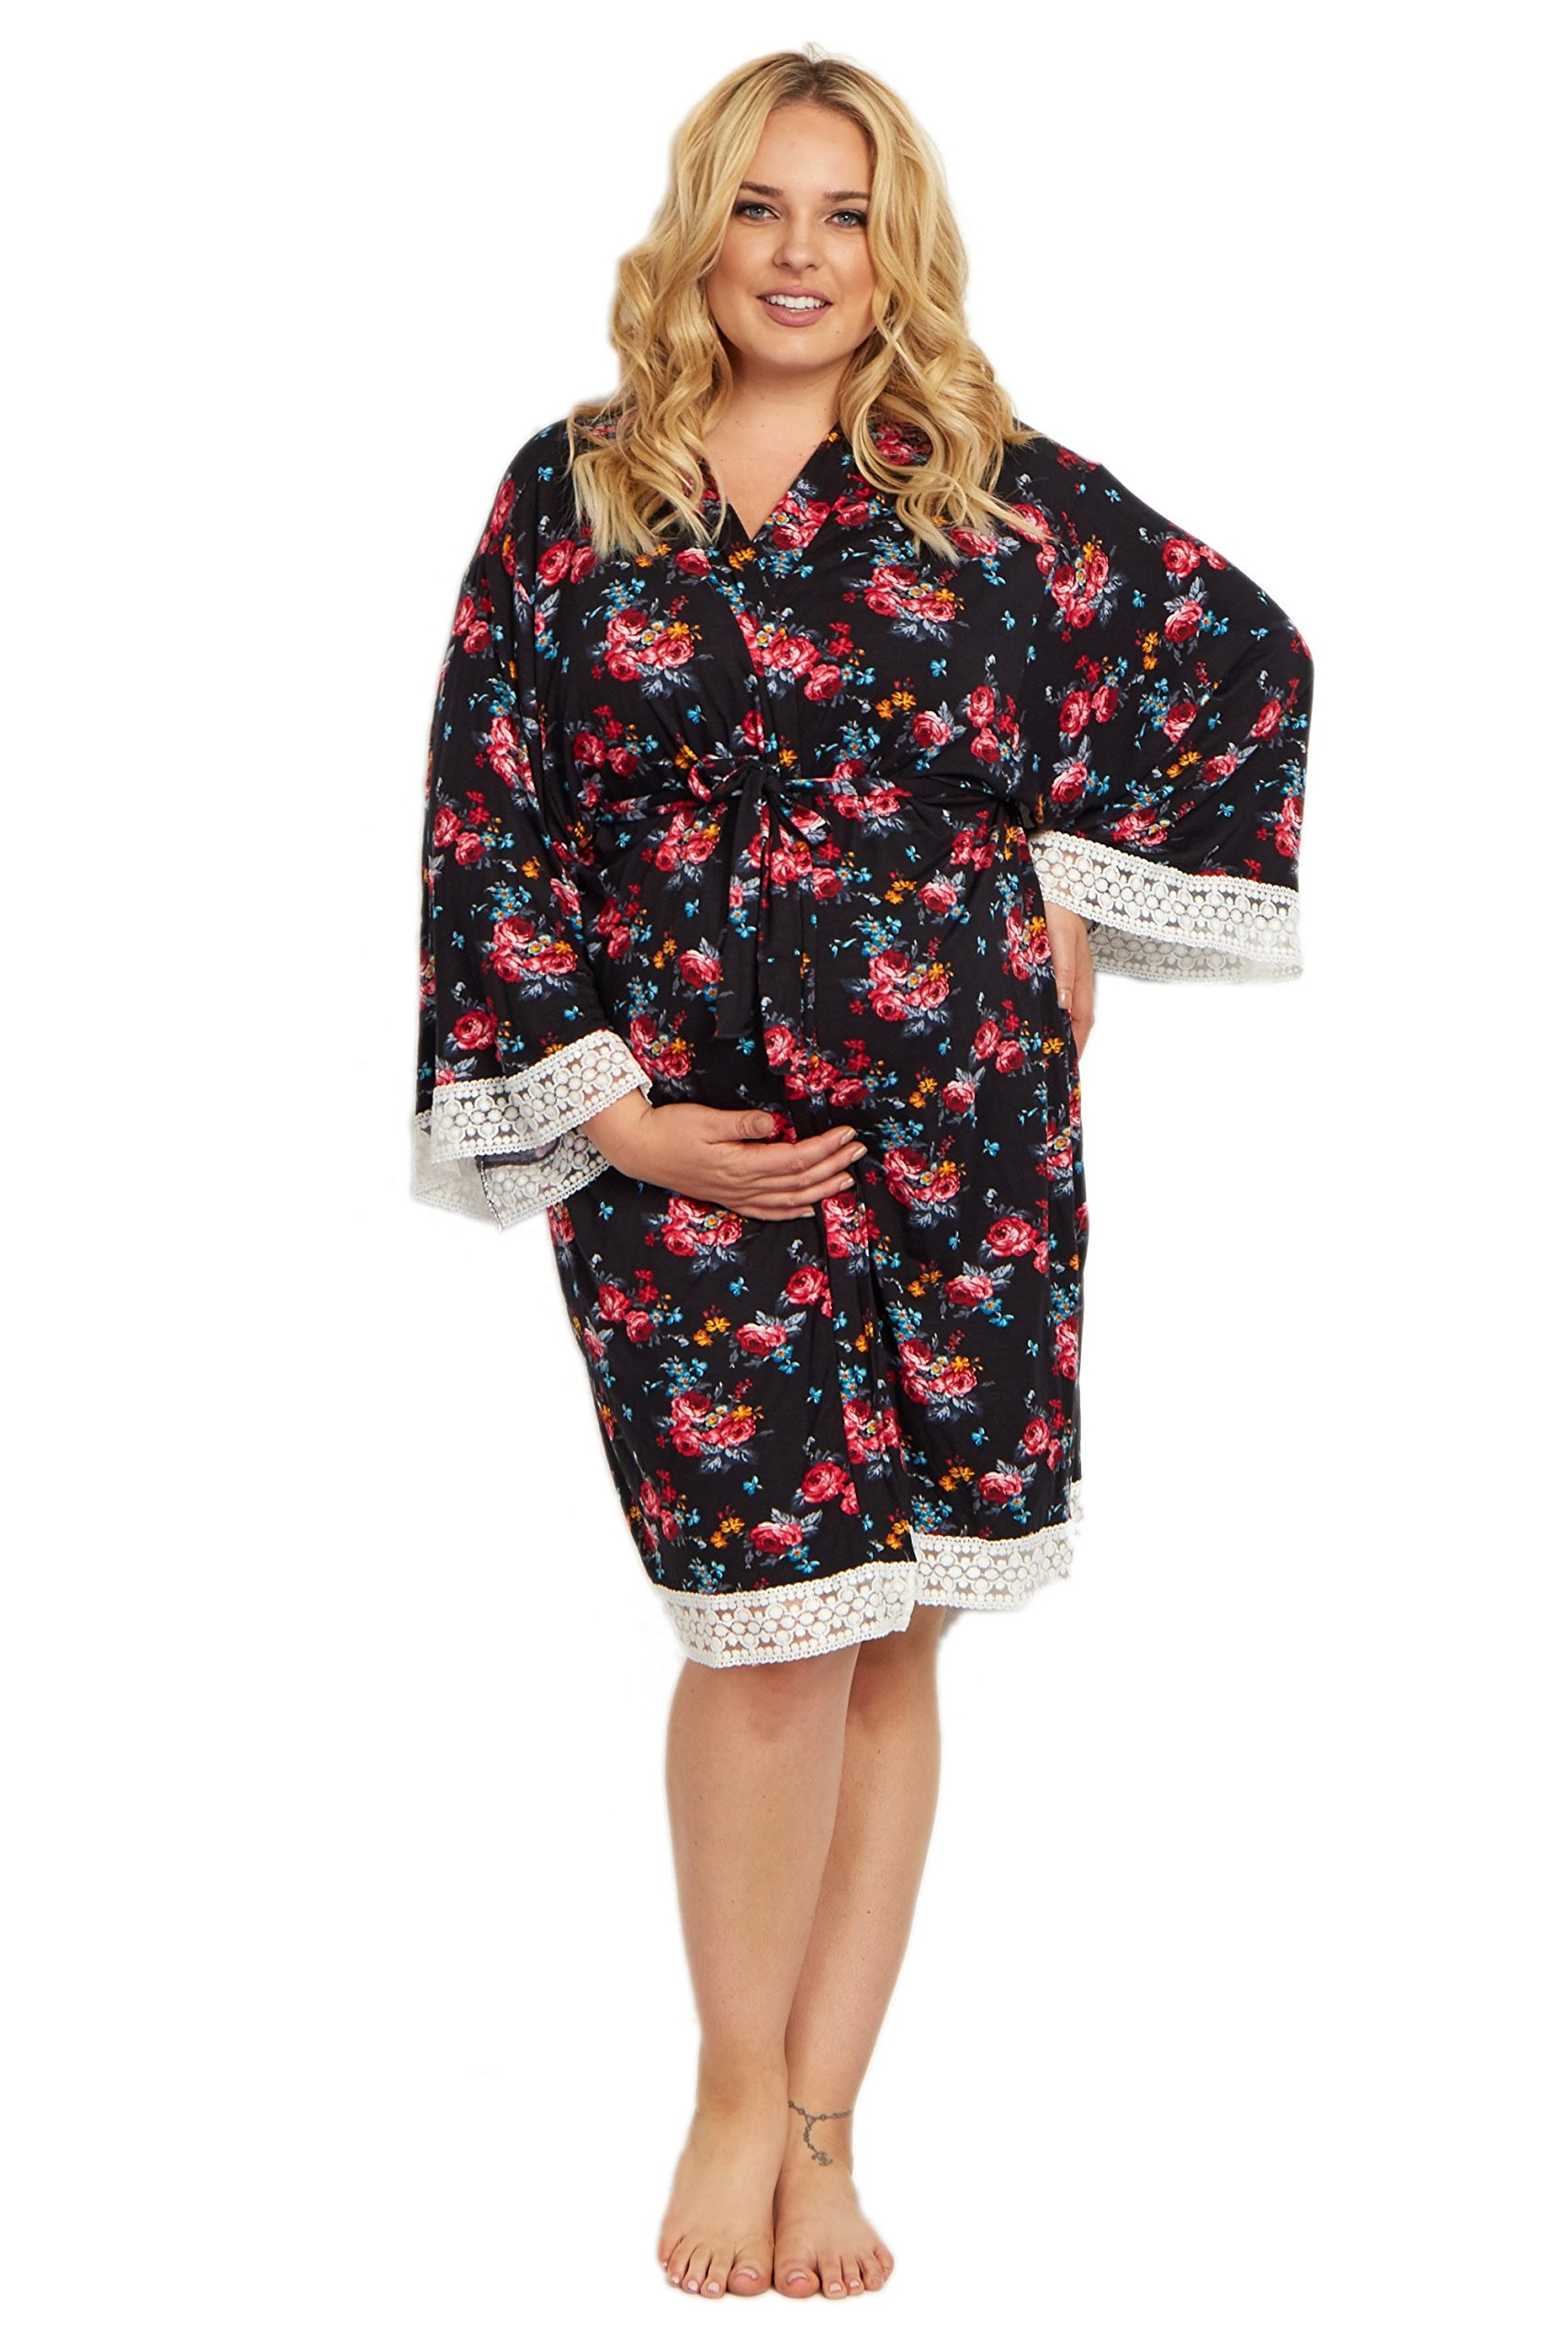 PinkBlush Maternity Black Floral Lace Trim Plus Size Delivery/Nursing Maternity